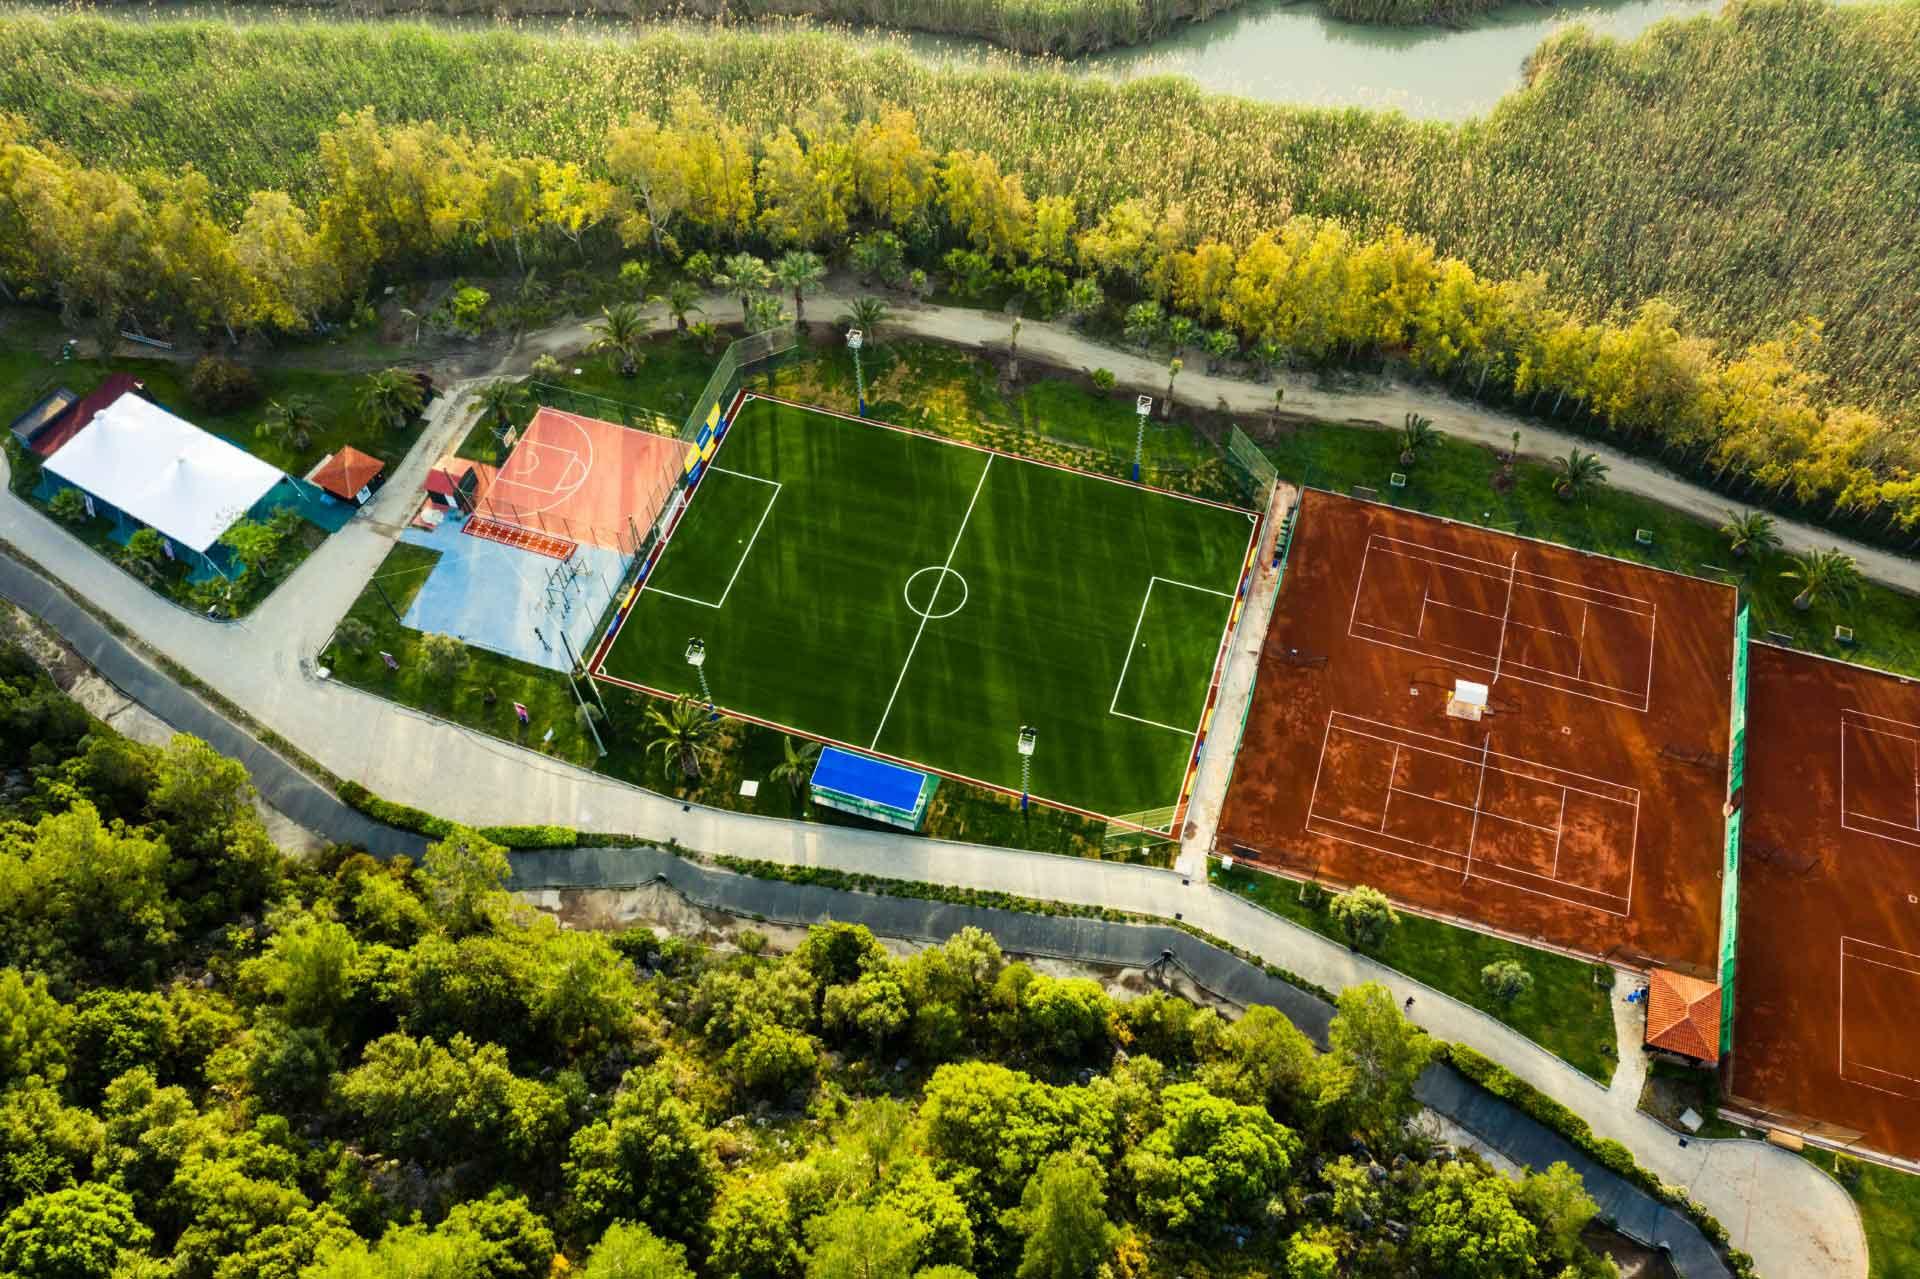 ROBINSON CLUB SARIGERME PARK -Sportplatz